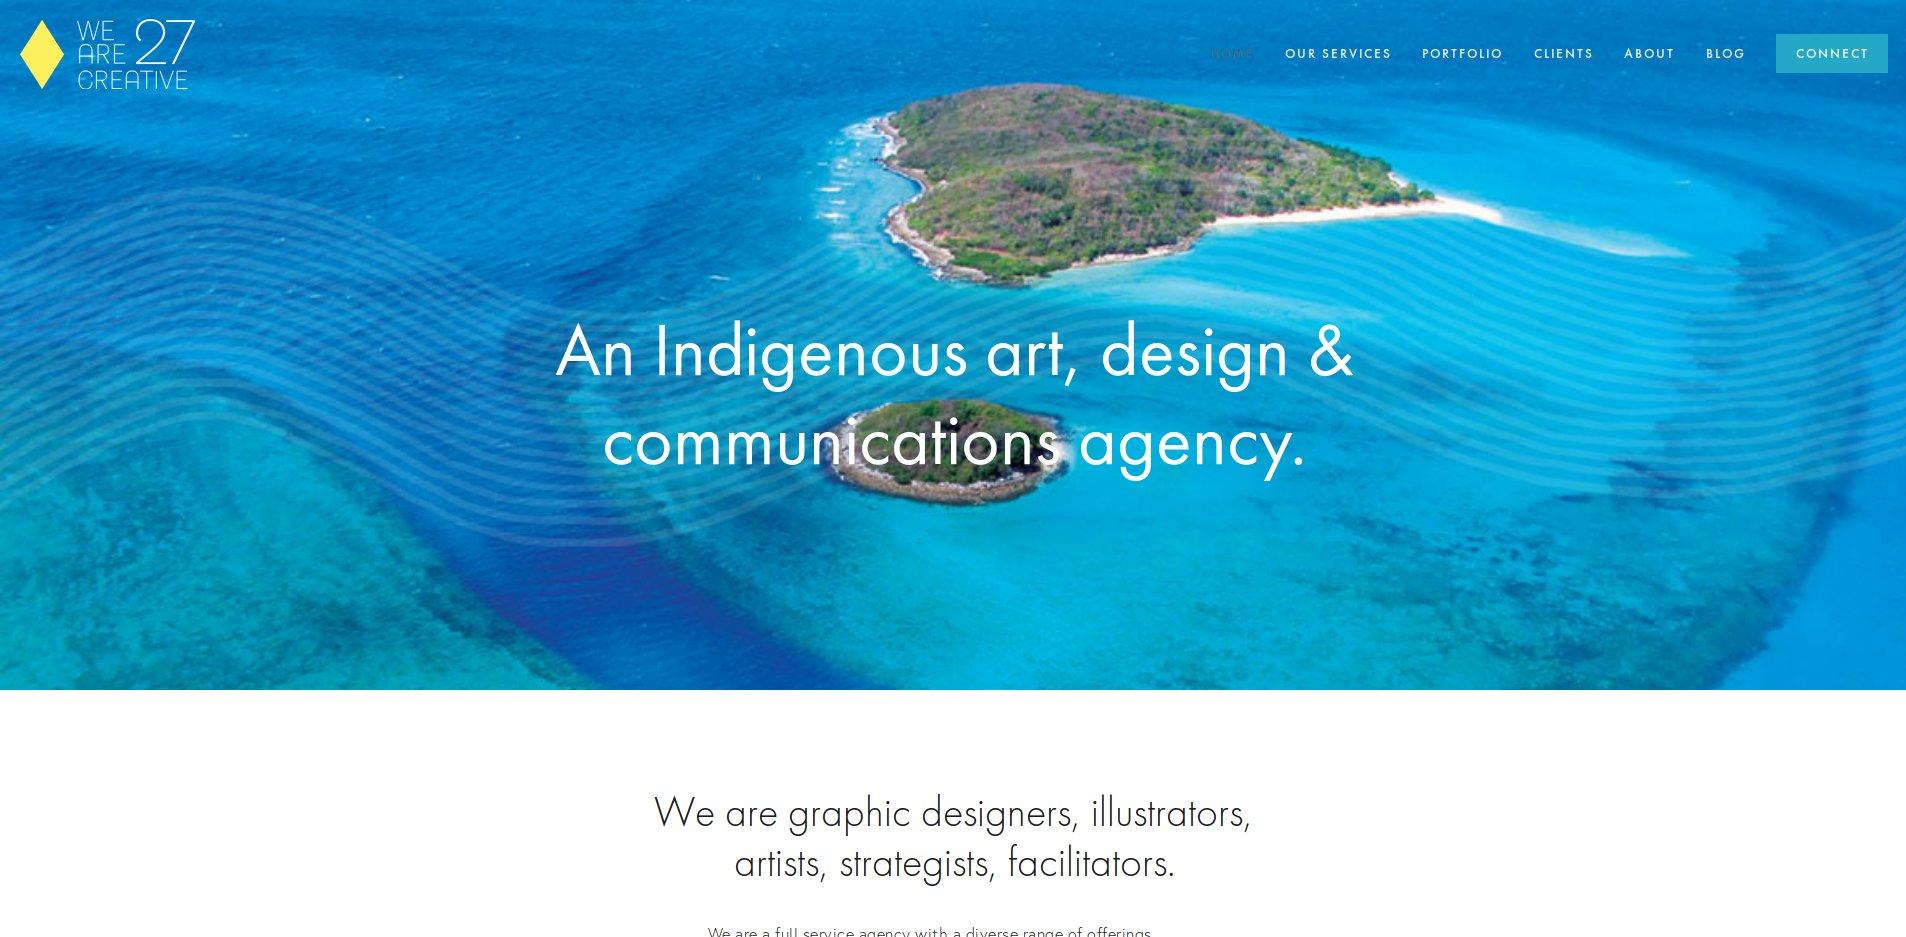 We are 27 Creative - We are graphic designers, illustrators,artists, strategists, facilitators.